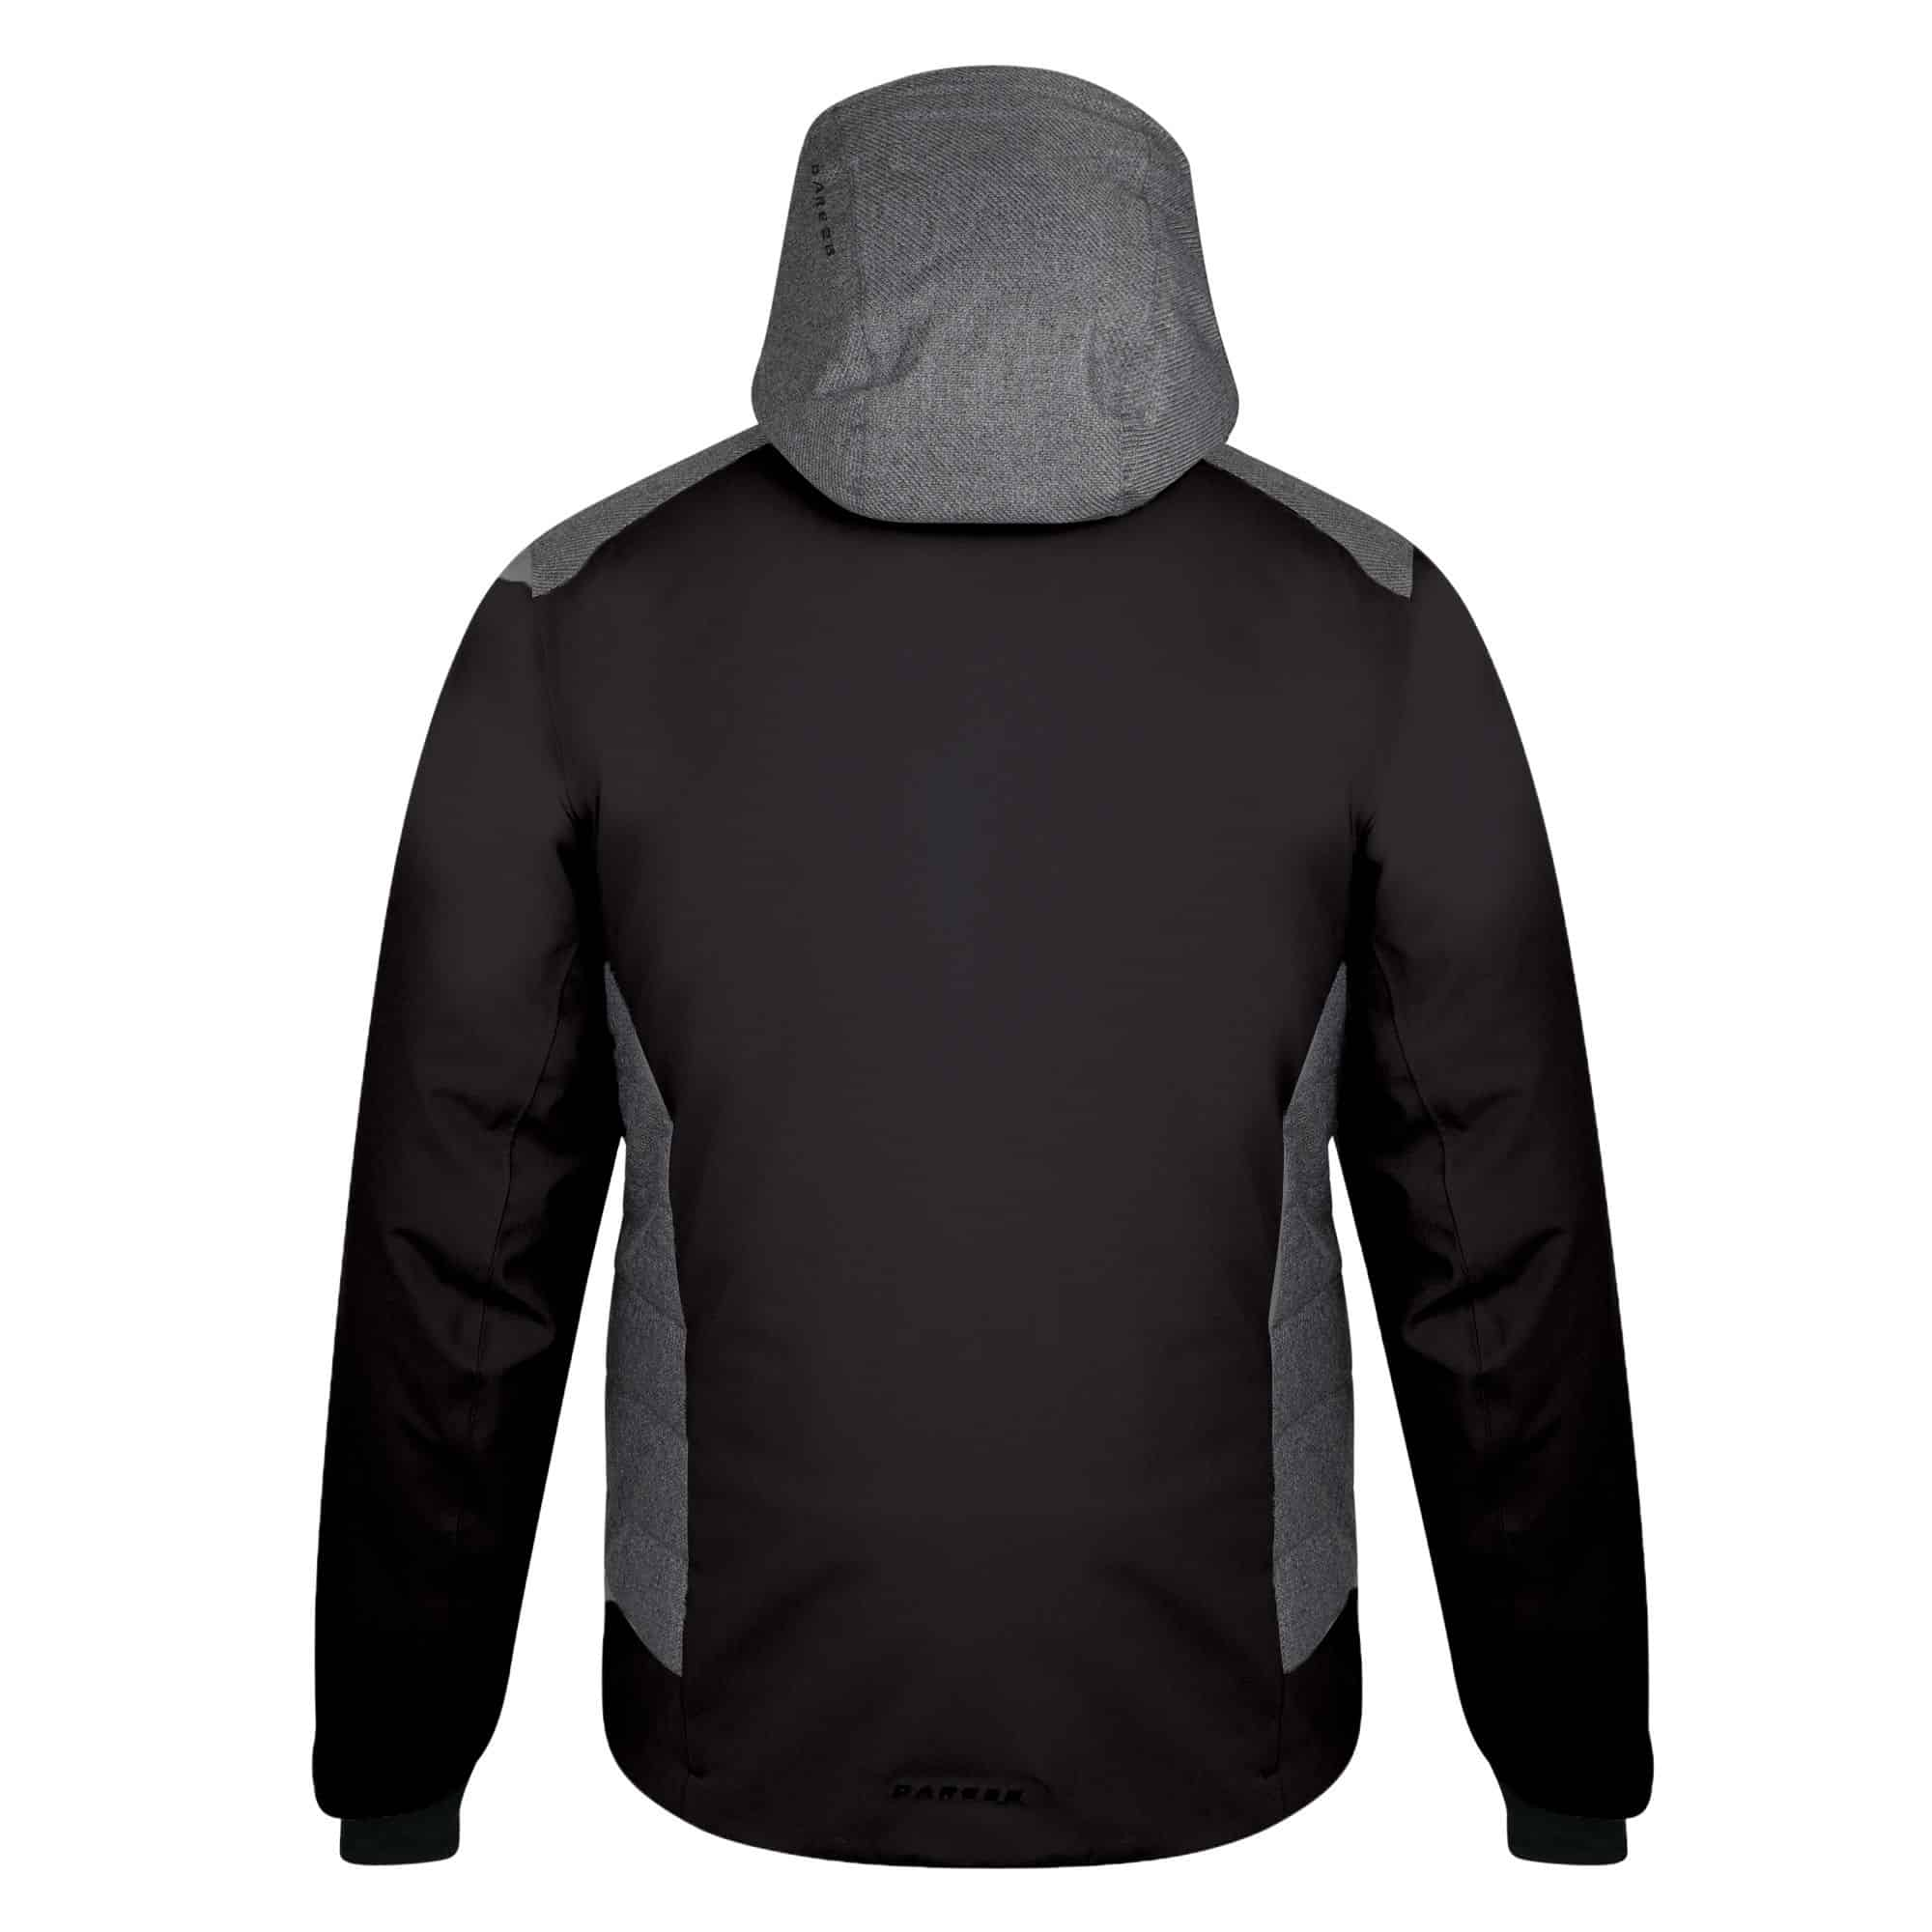 rendition 1718 jacket black rear